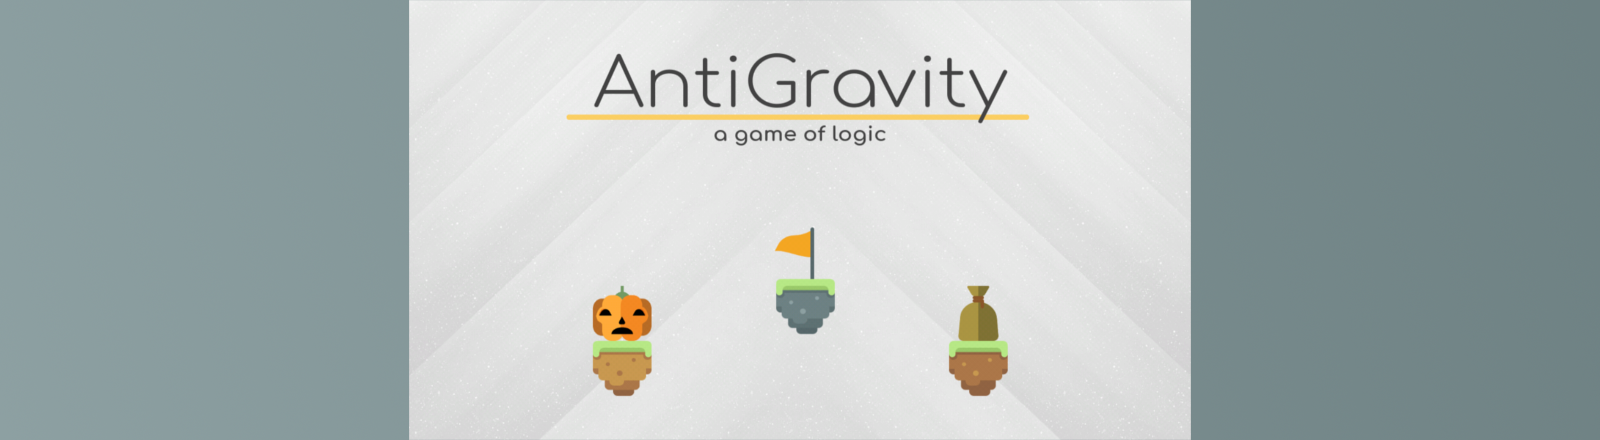 AntiGravity Puzzle Game